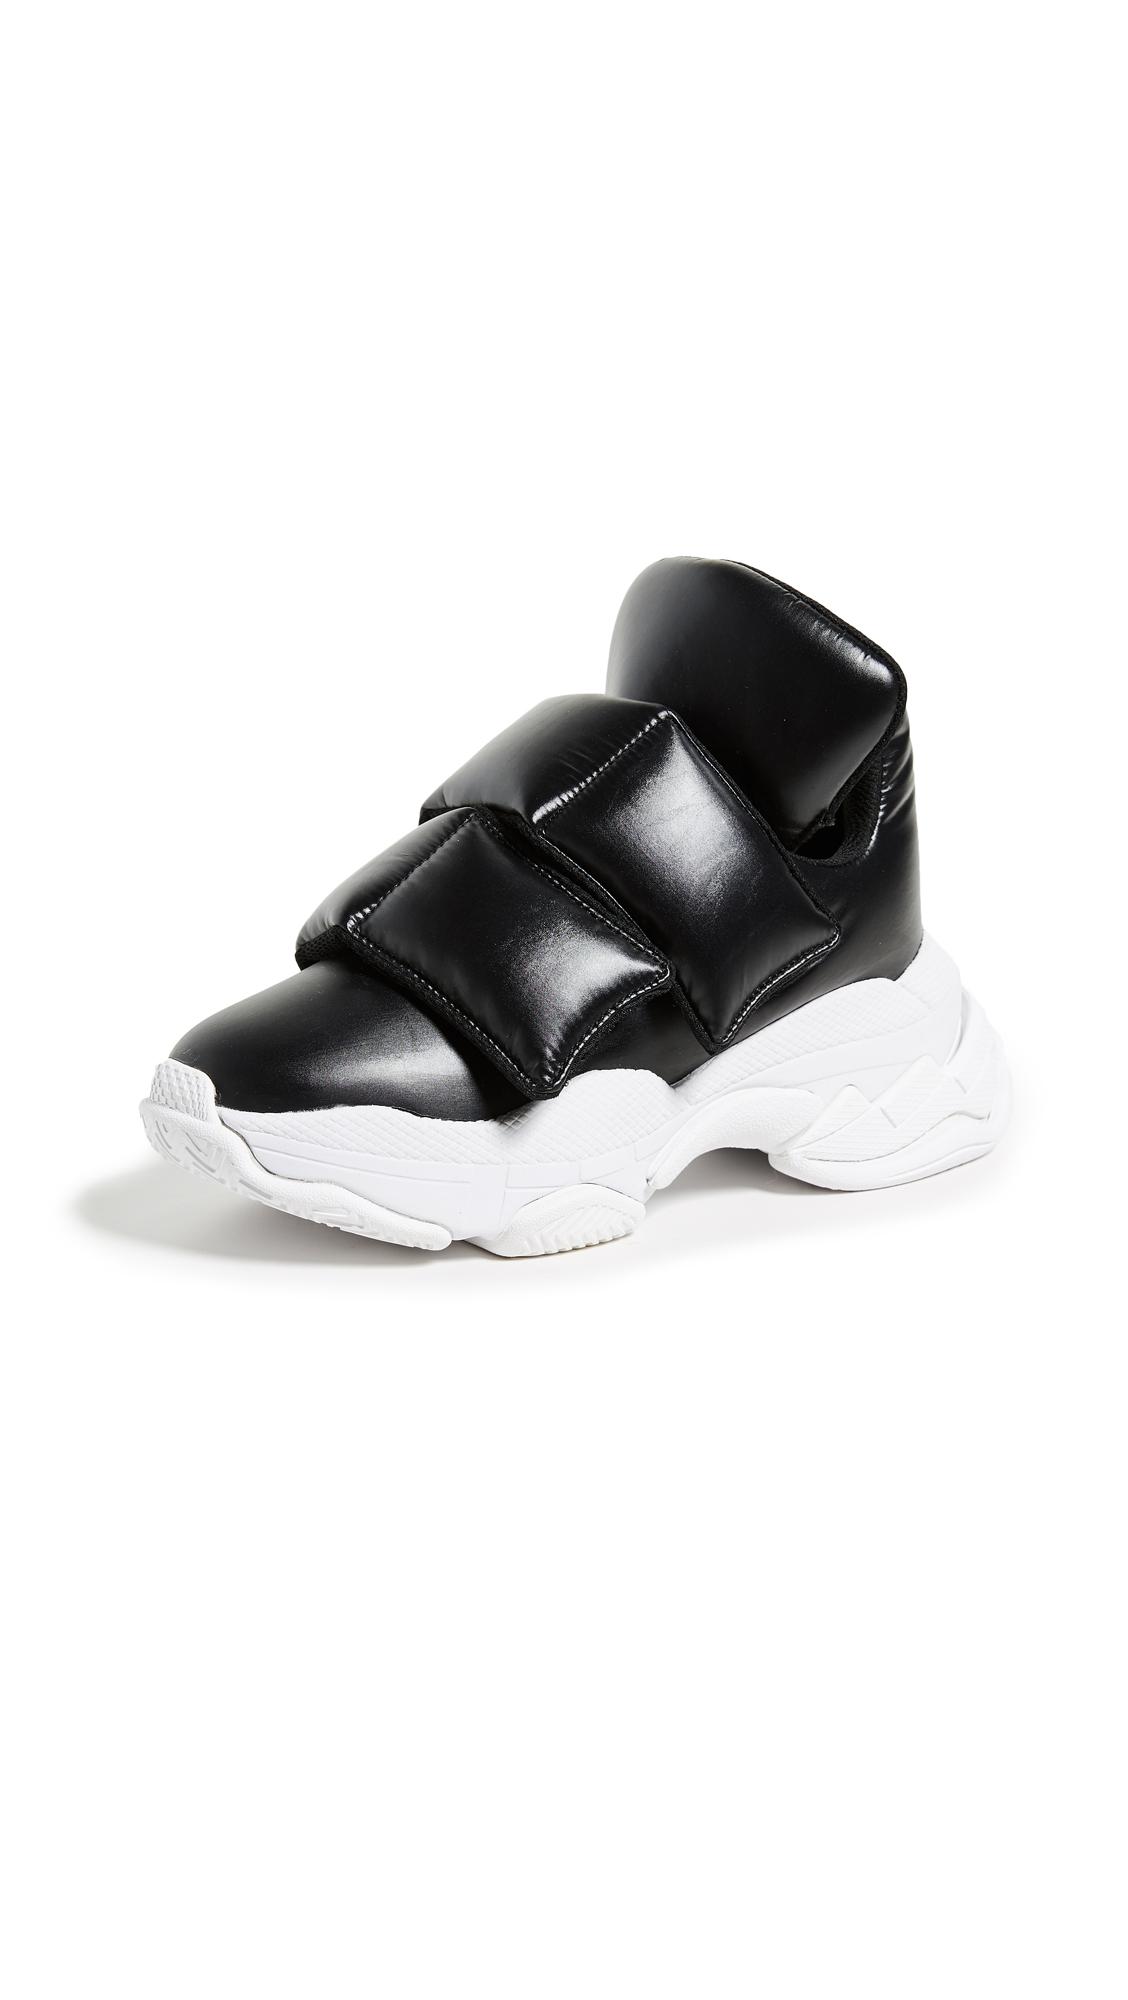 Jeffrey Campbell Retina Velcro Sneakers